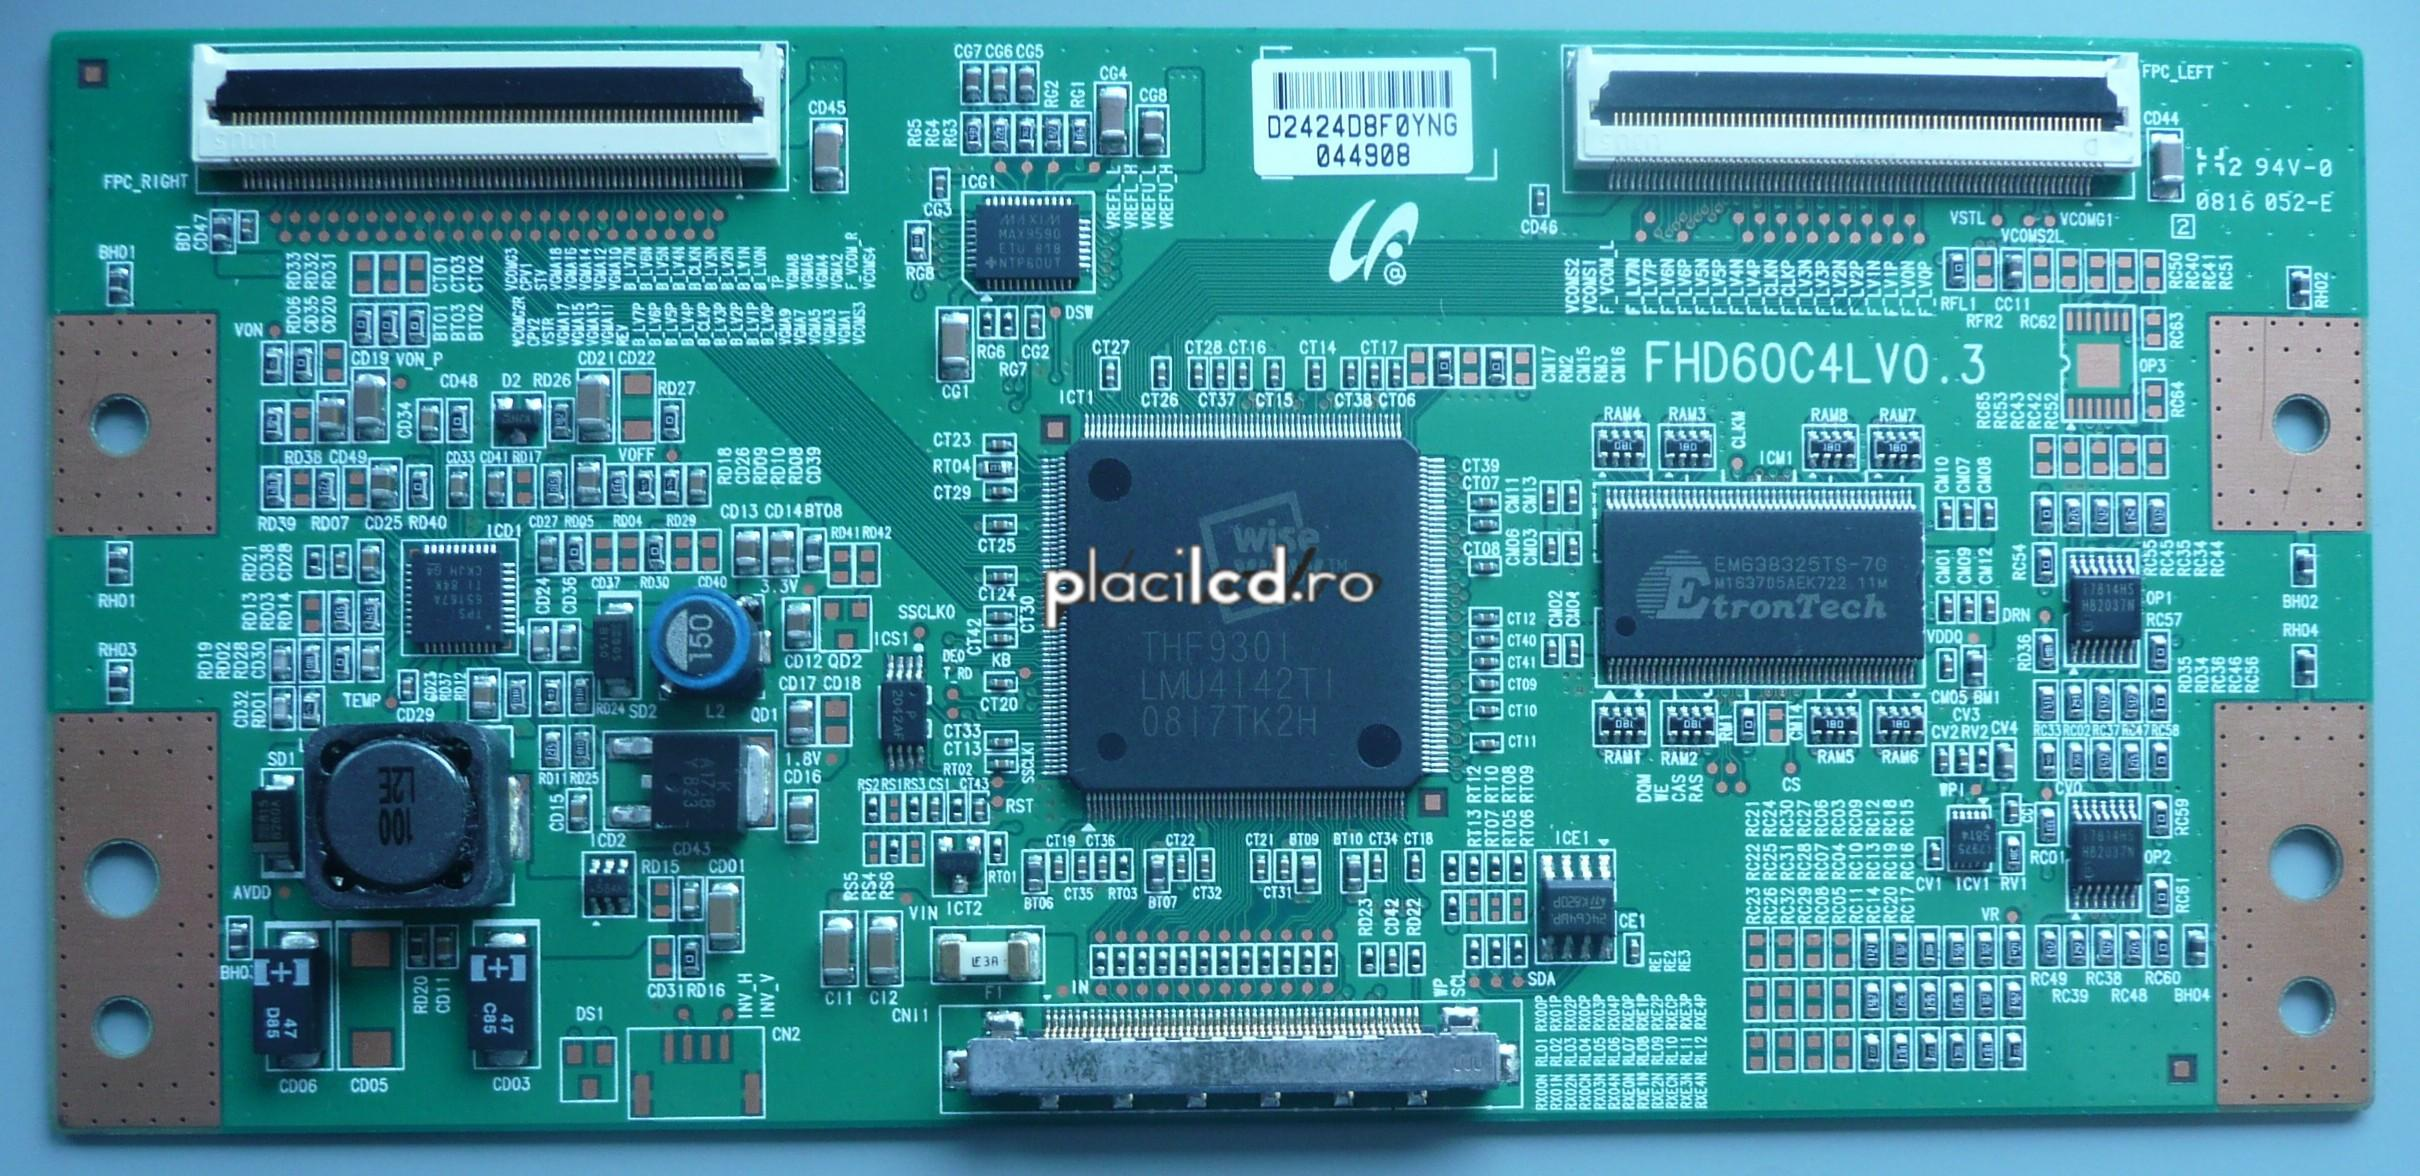 Placa LVDS FHD60C4LV0.3